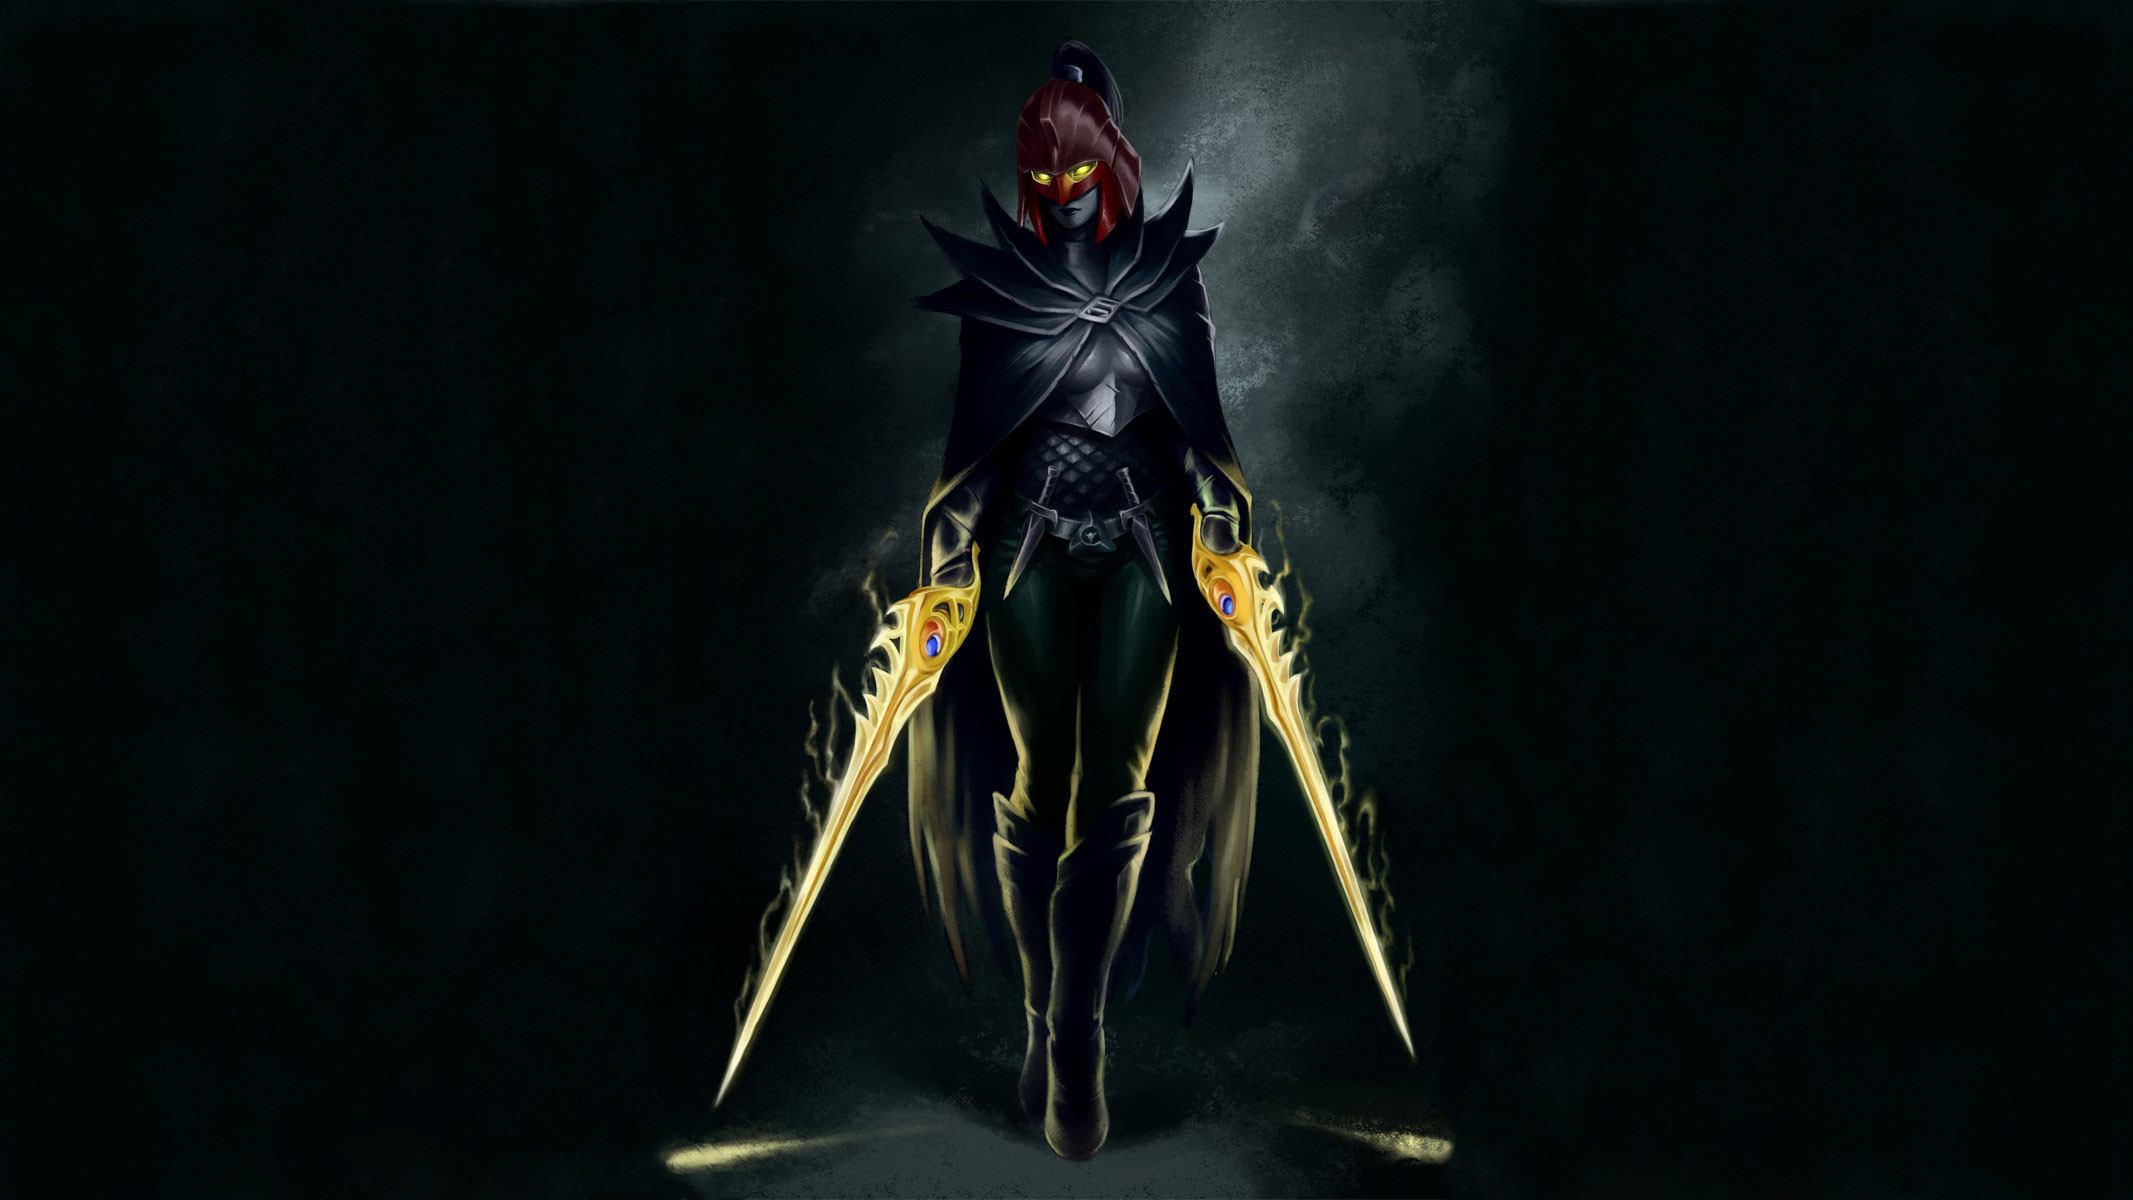 Dota 2 Templar Assassin Wallpaper 82 Images